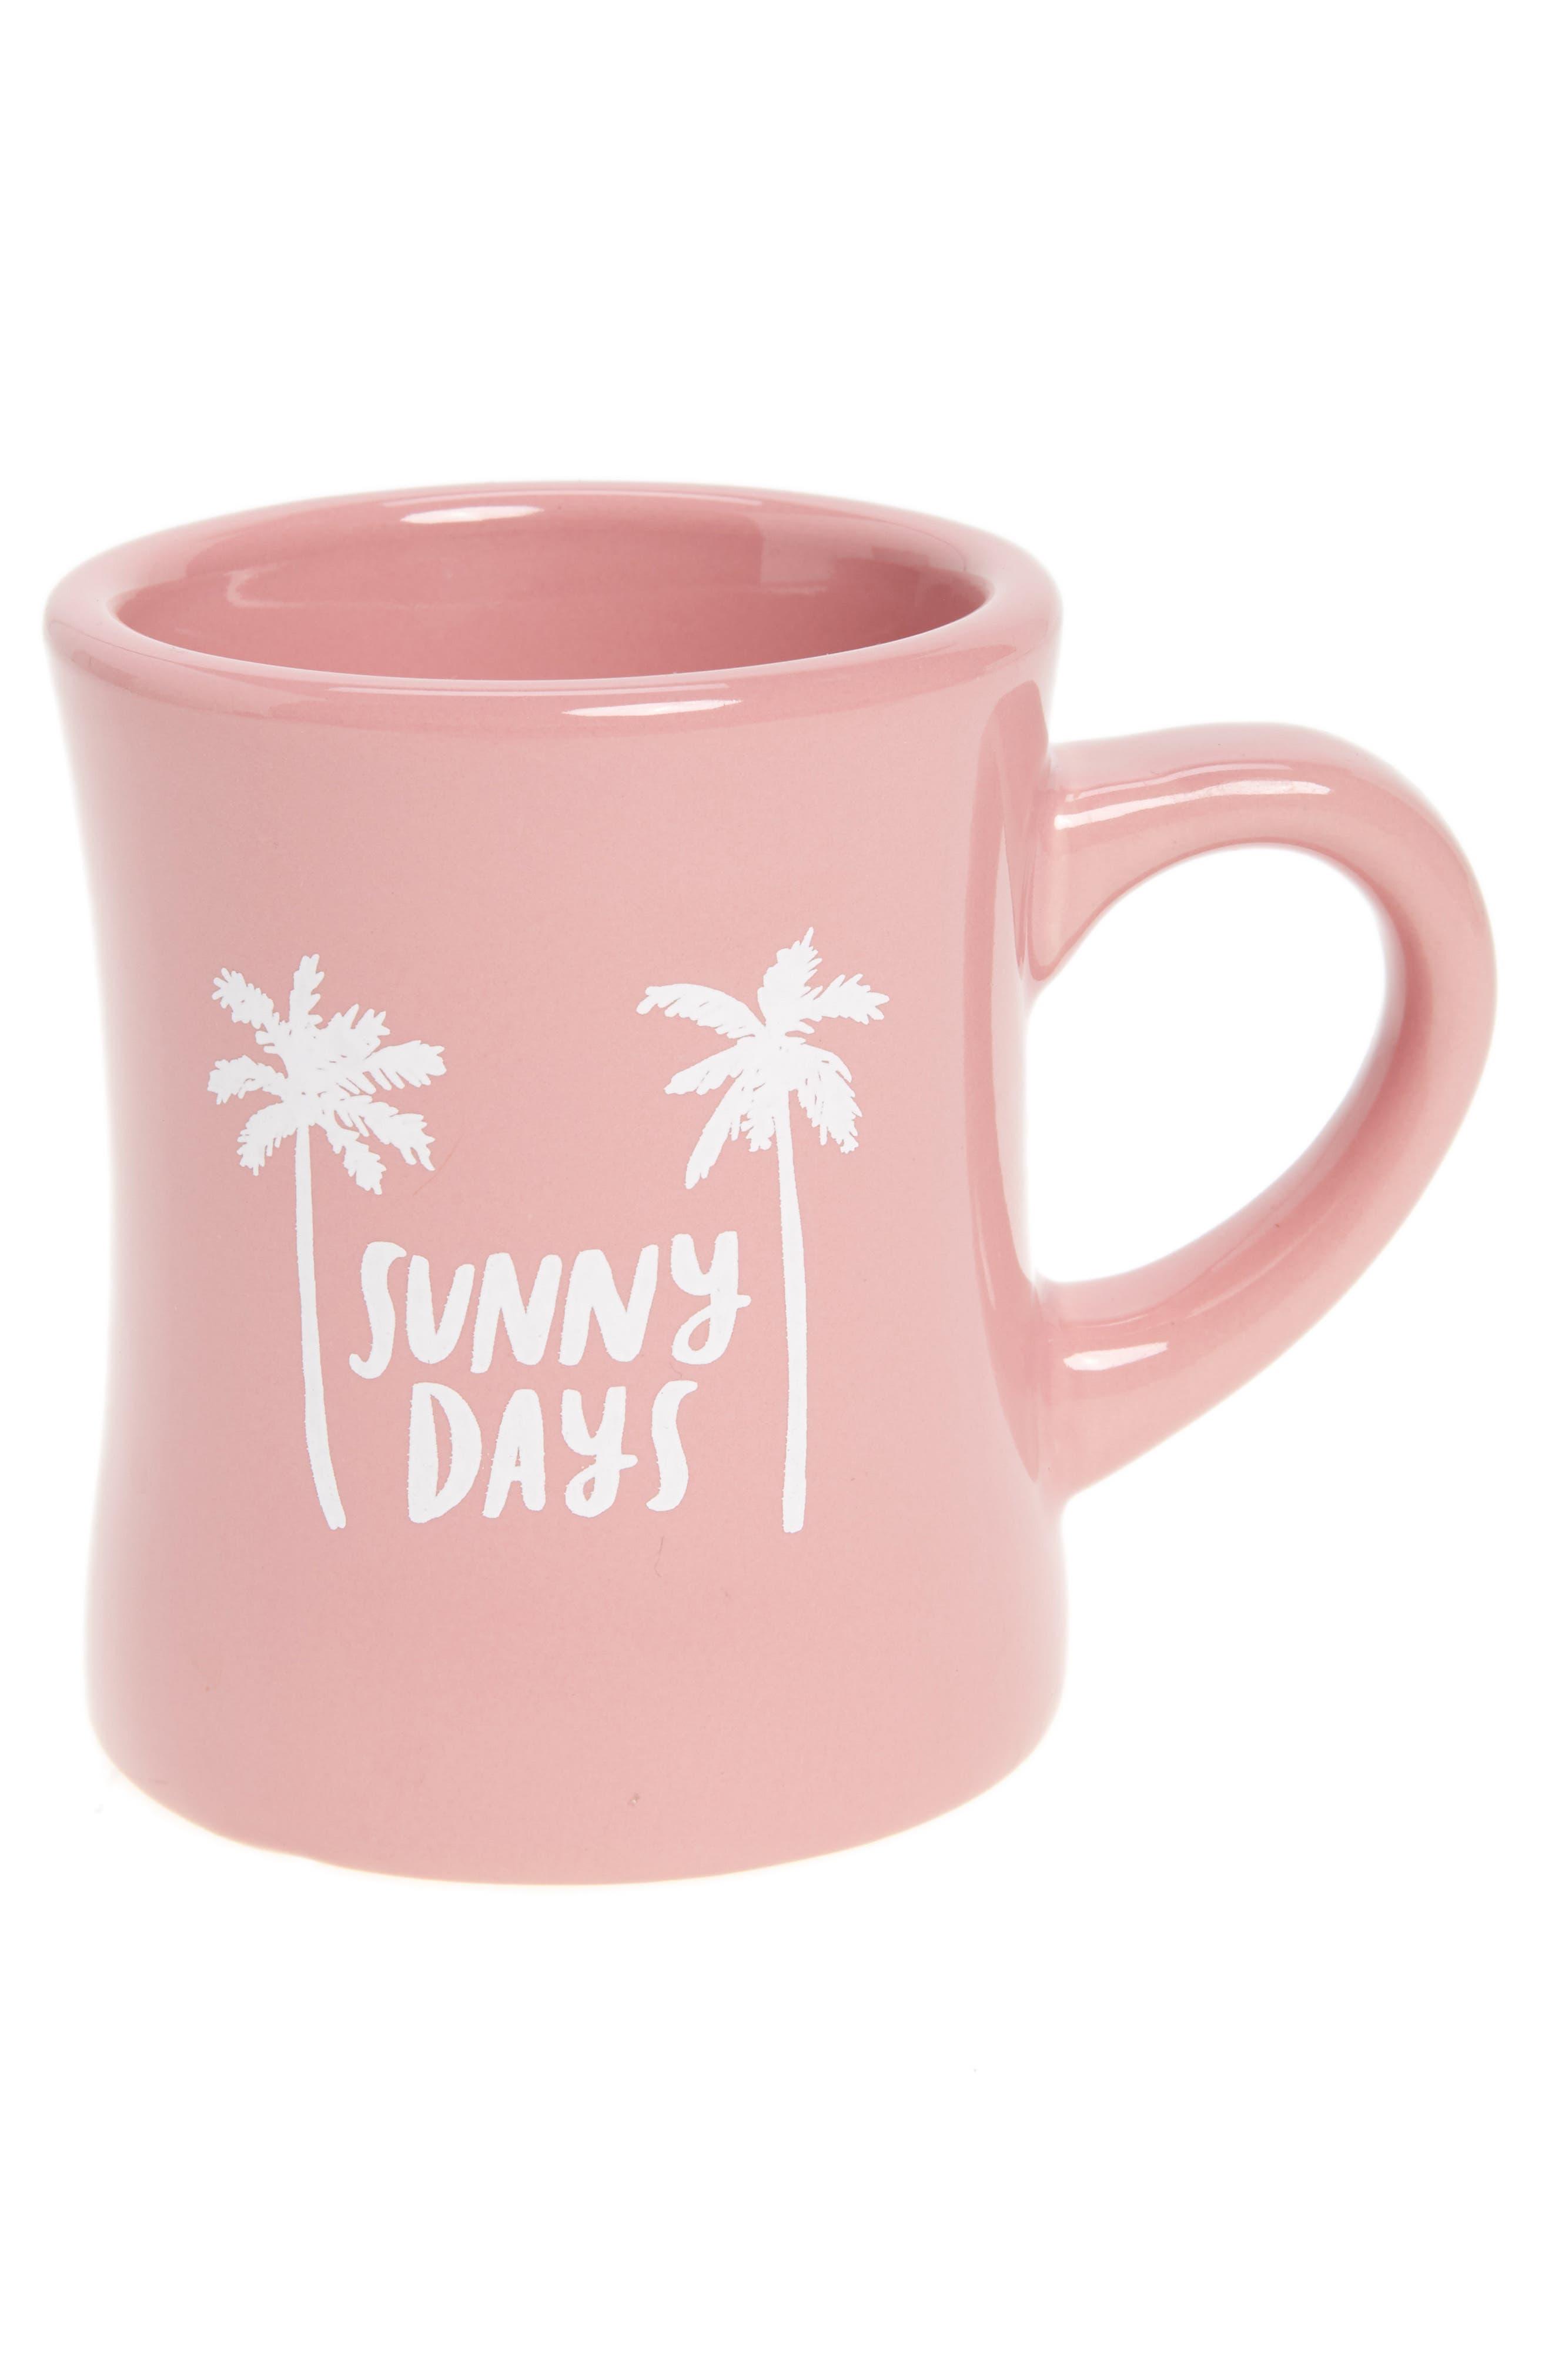 The Created Co. Sunny Days Ceramic Mug